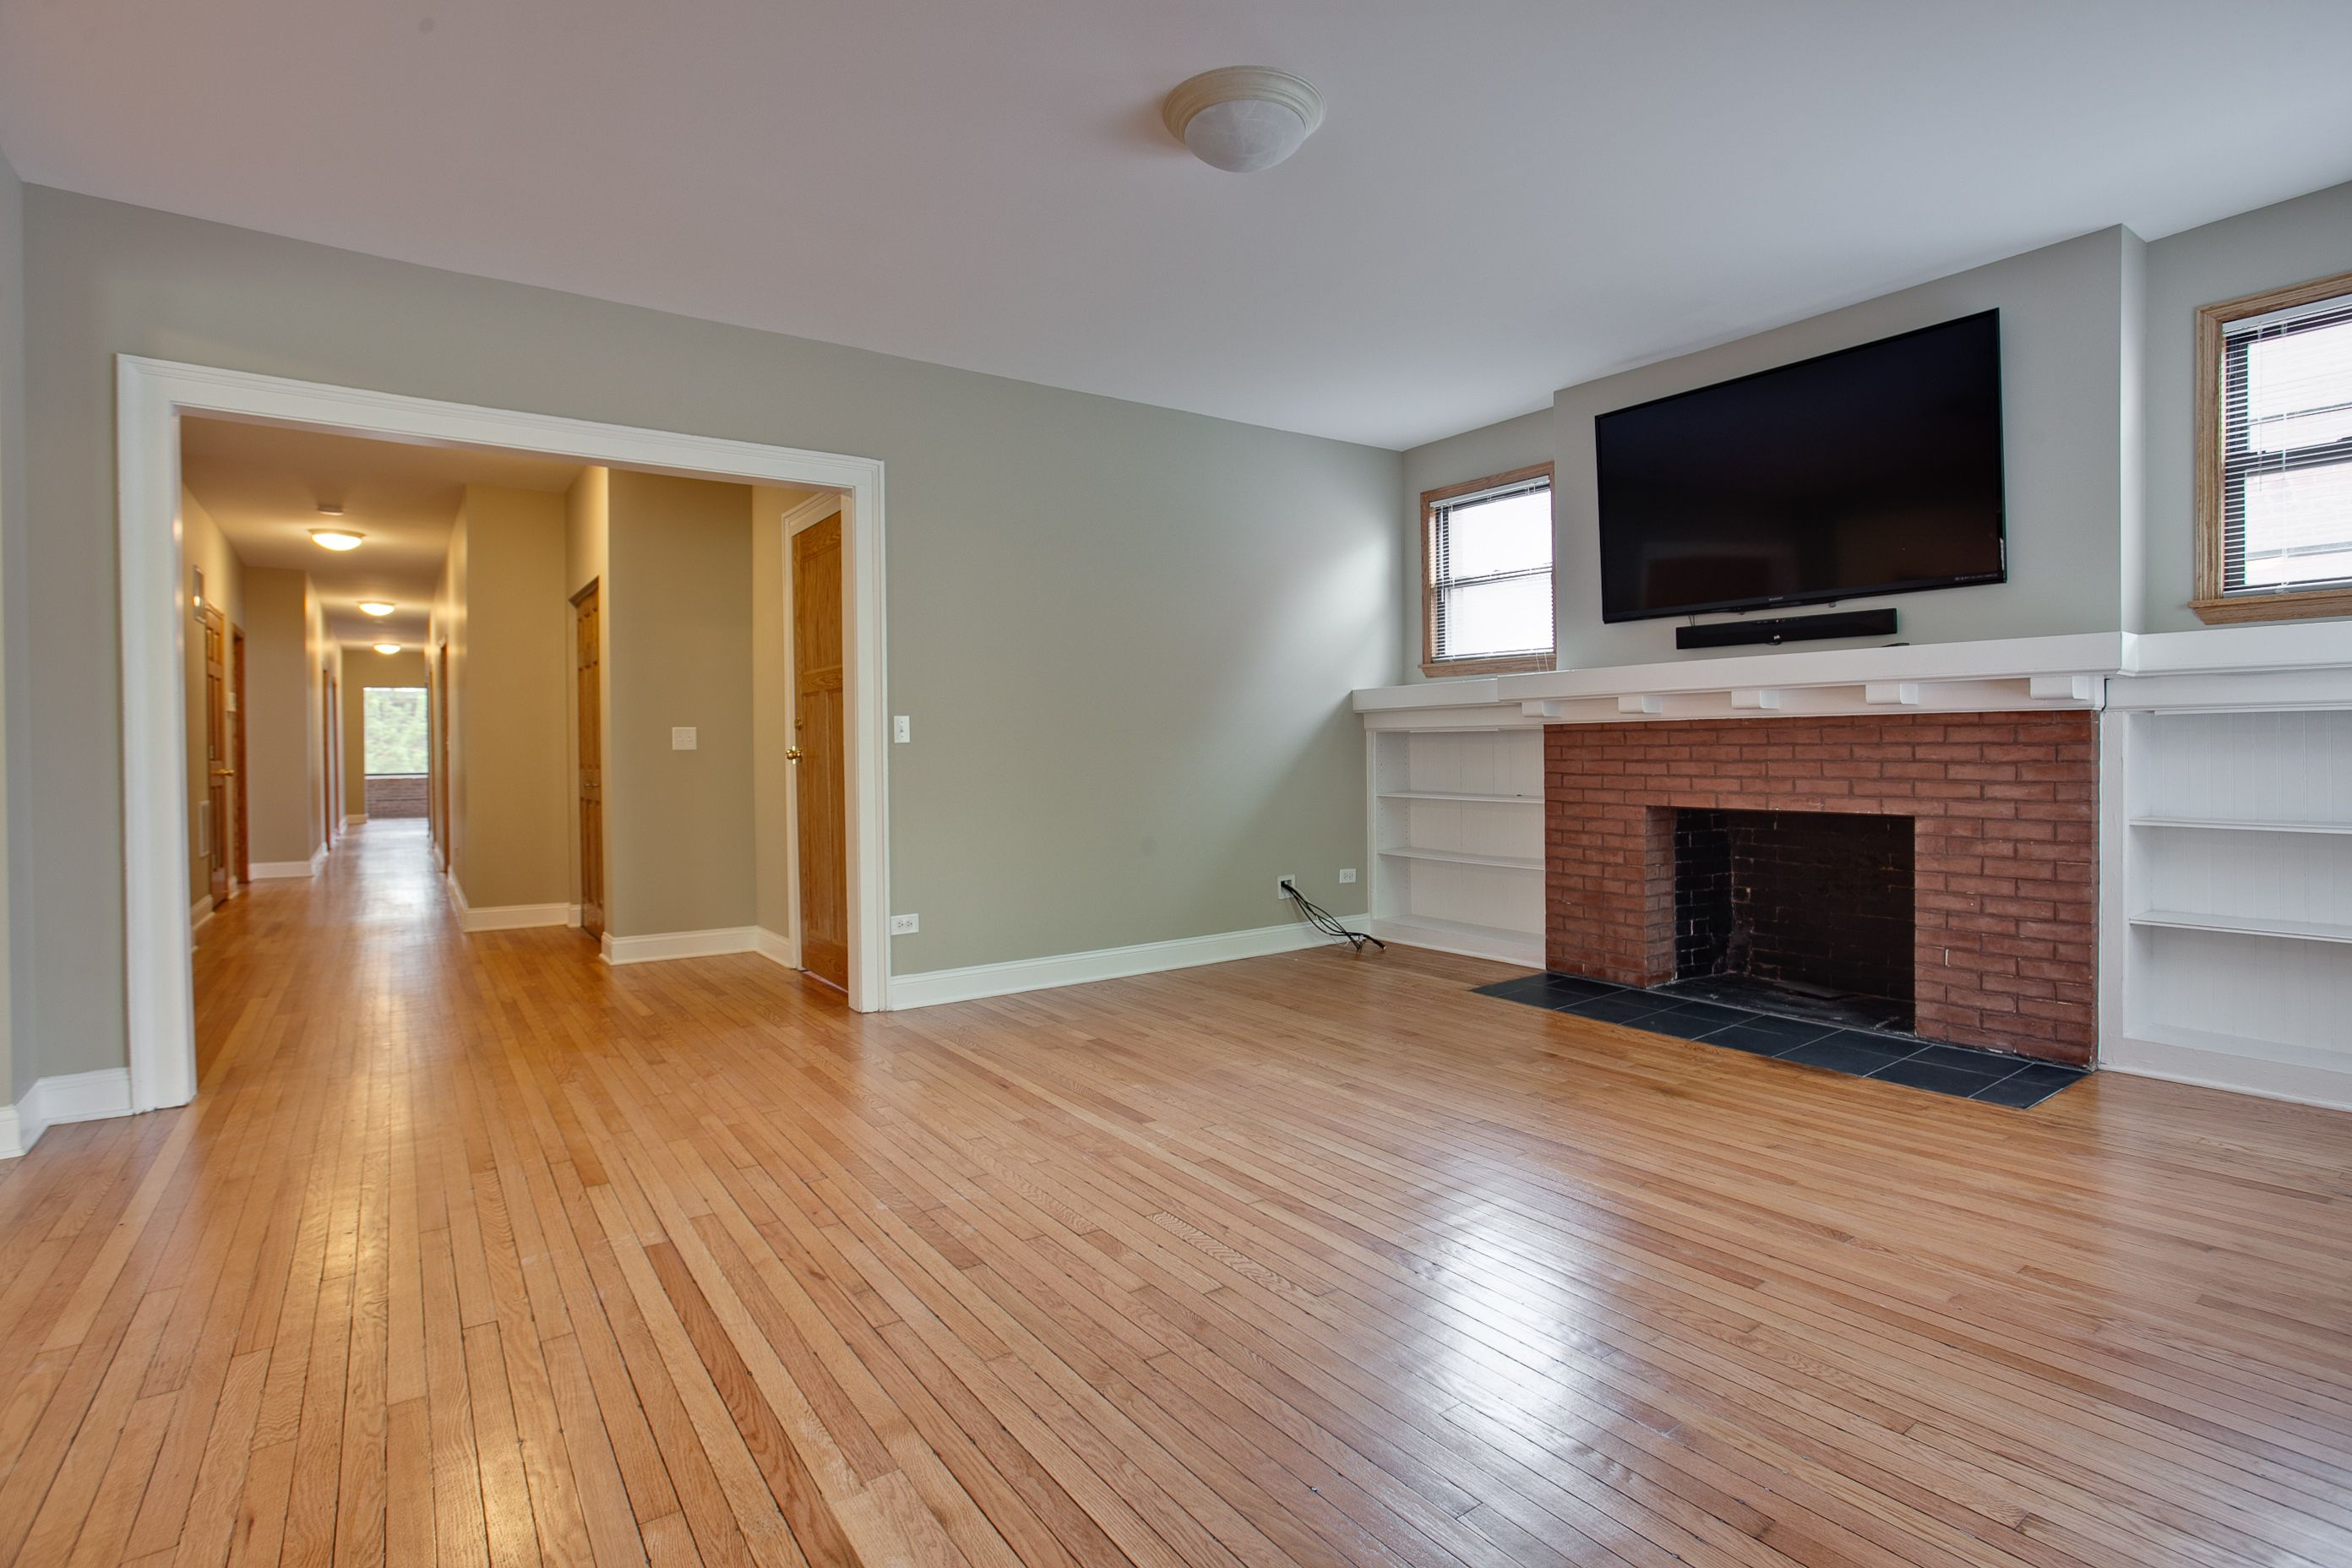 Craigslist Denver Apartment Rentals